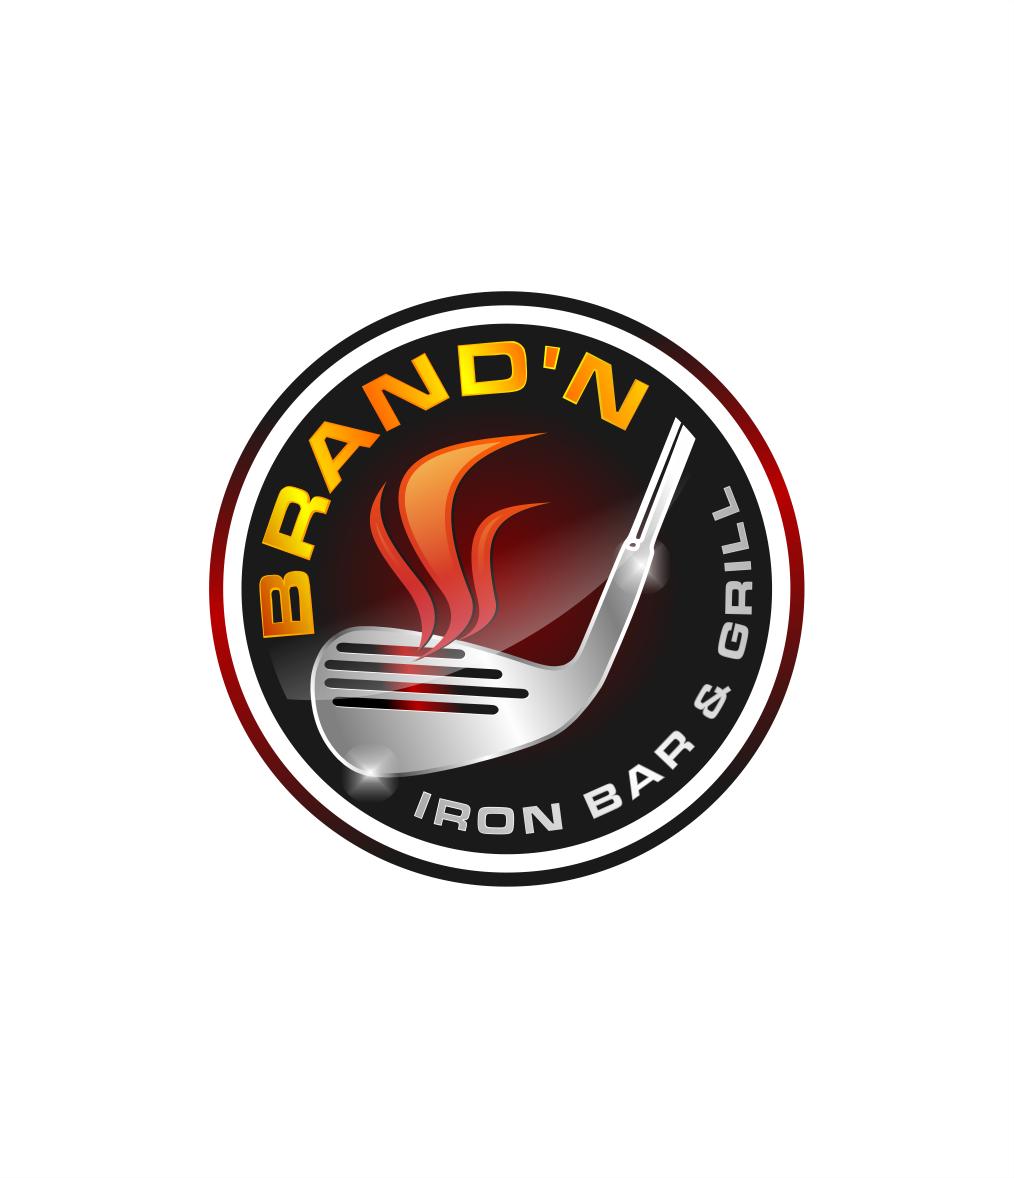 Logo Design by Raymond Garcia - Entry No. 225 in the Logo Design Contest Captivating Logo Design for Brand'n Iron Bar & Grill.